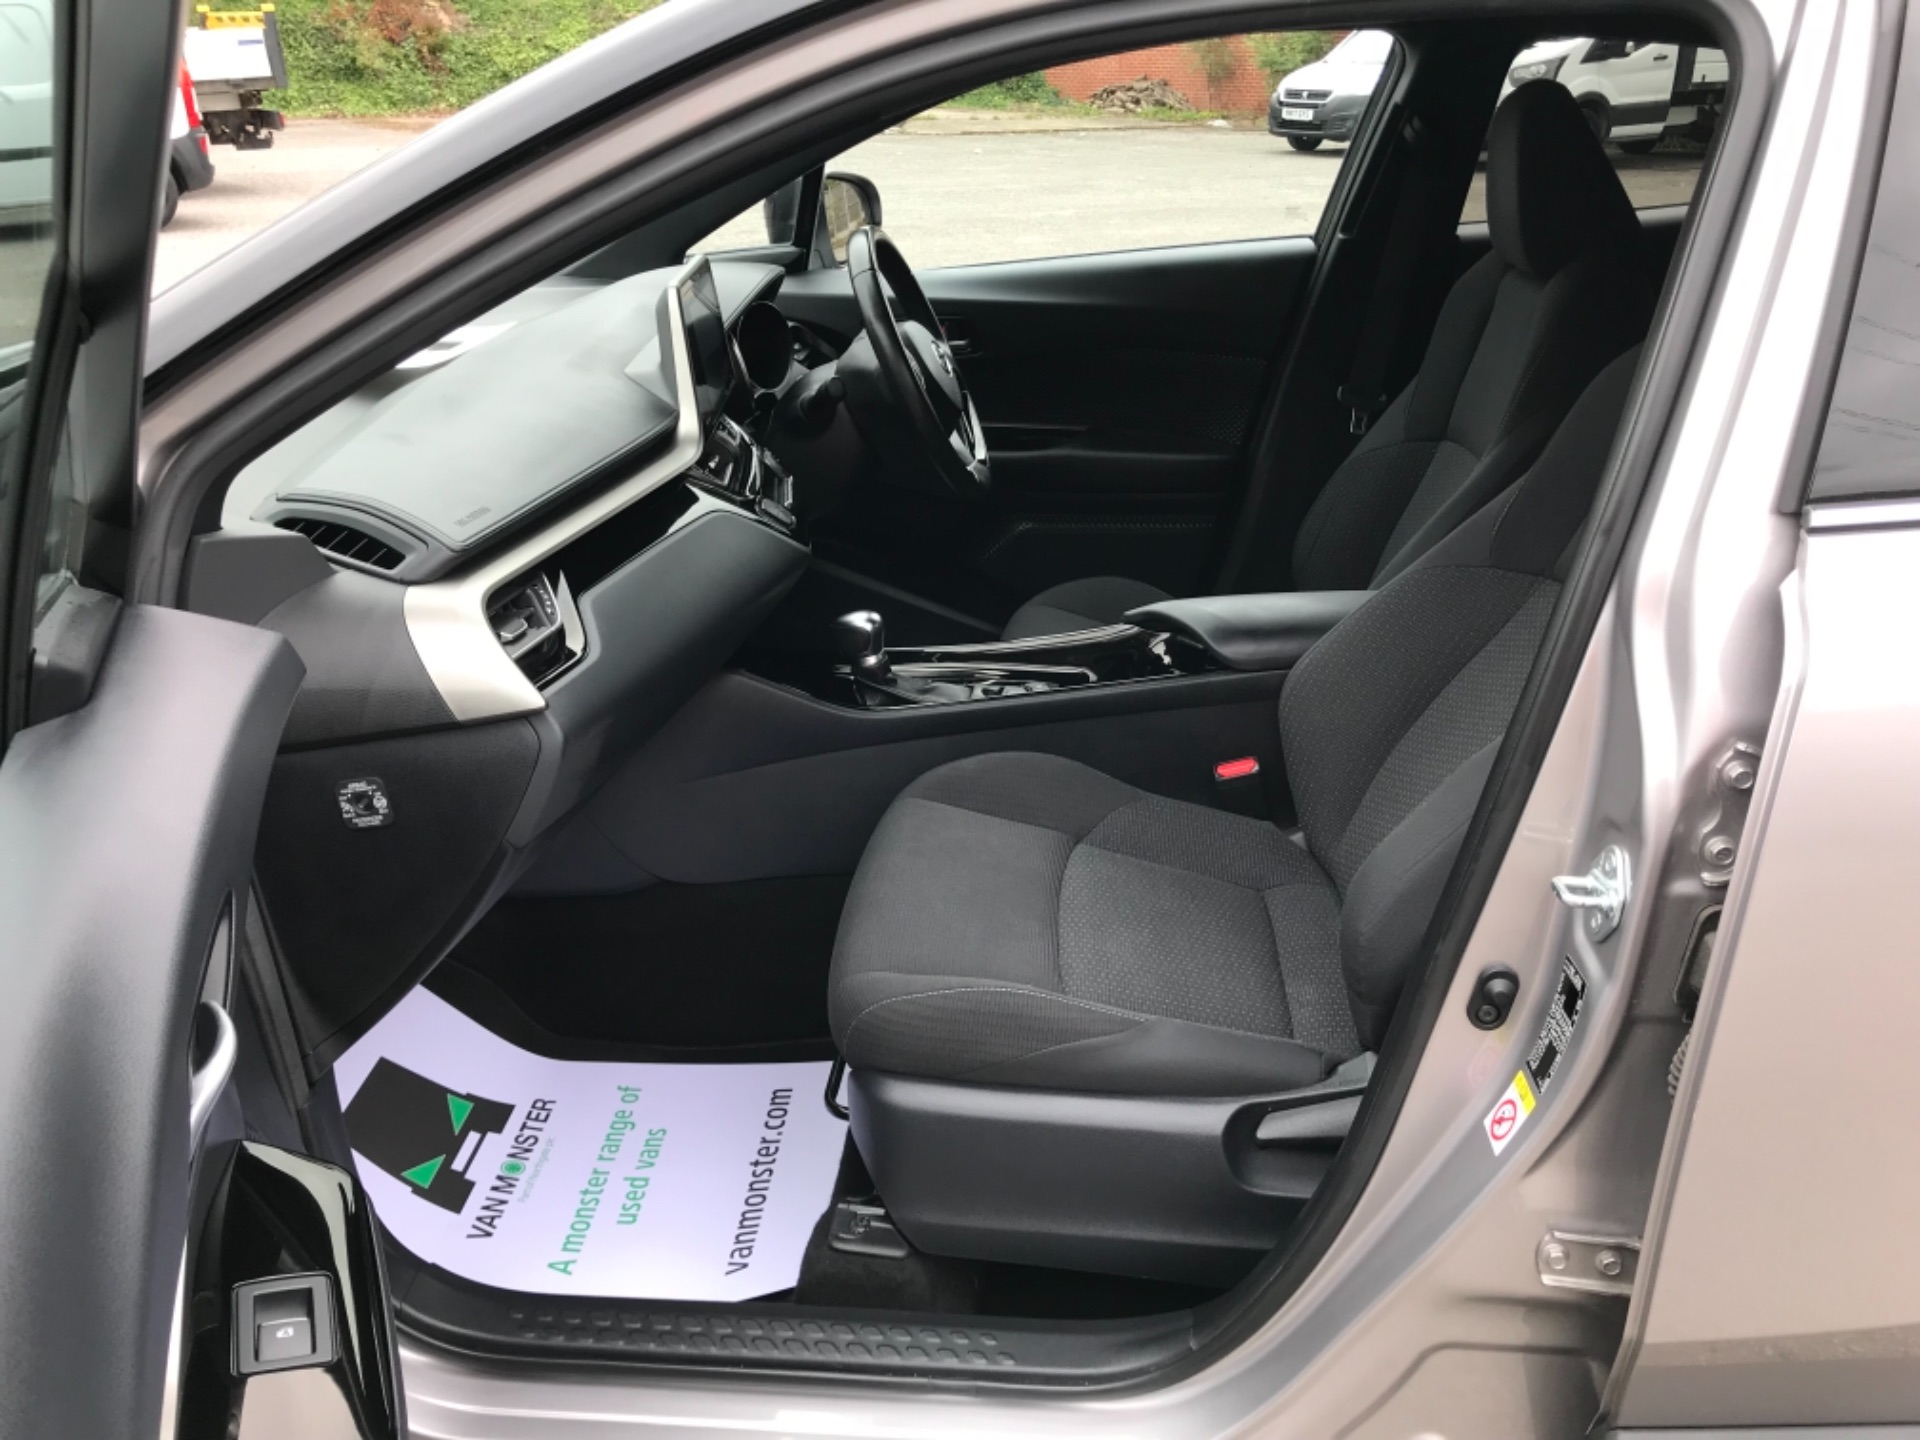 2018 Toyota C-Hr 1.8 Hybrid Dynamic 5Dr Cvt (NV18NVX) Image 38